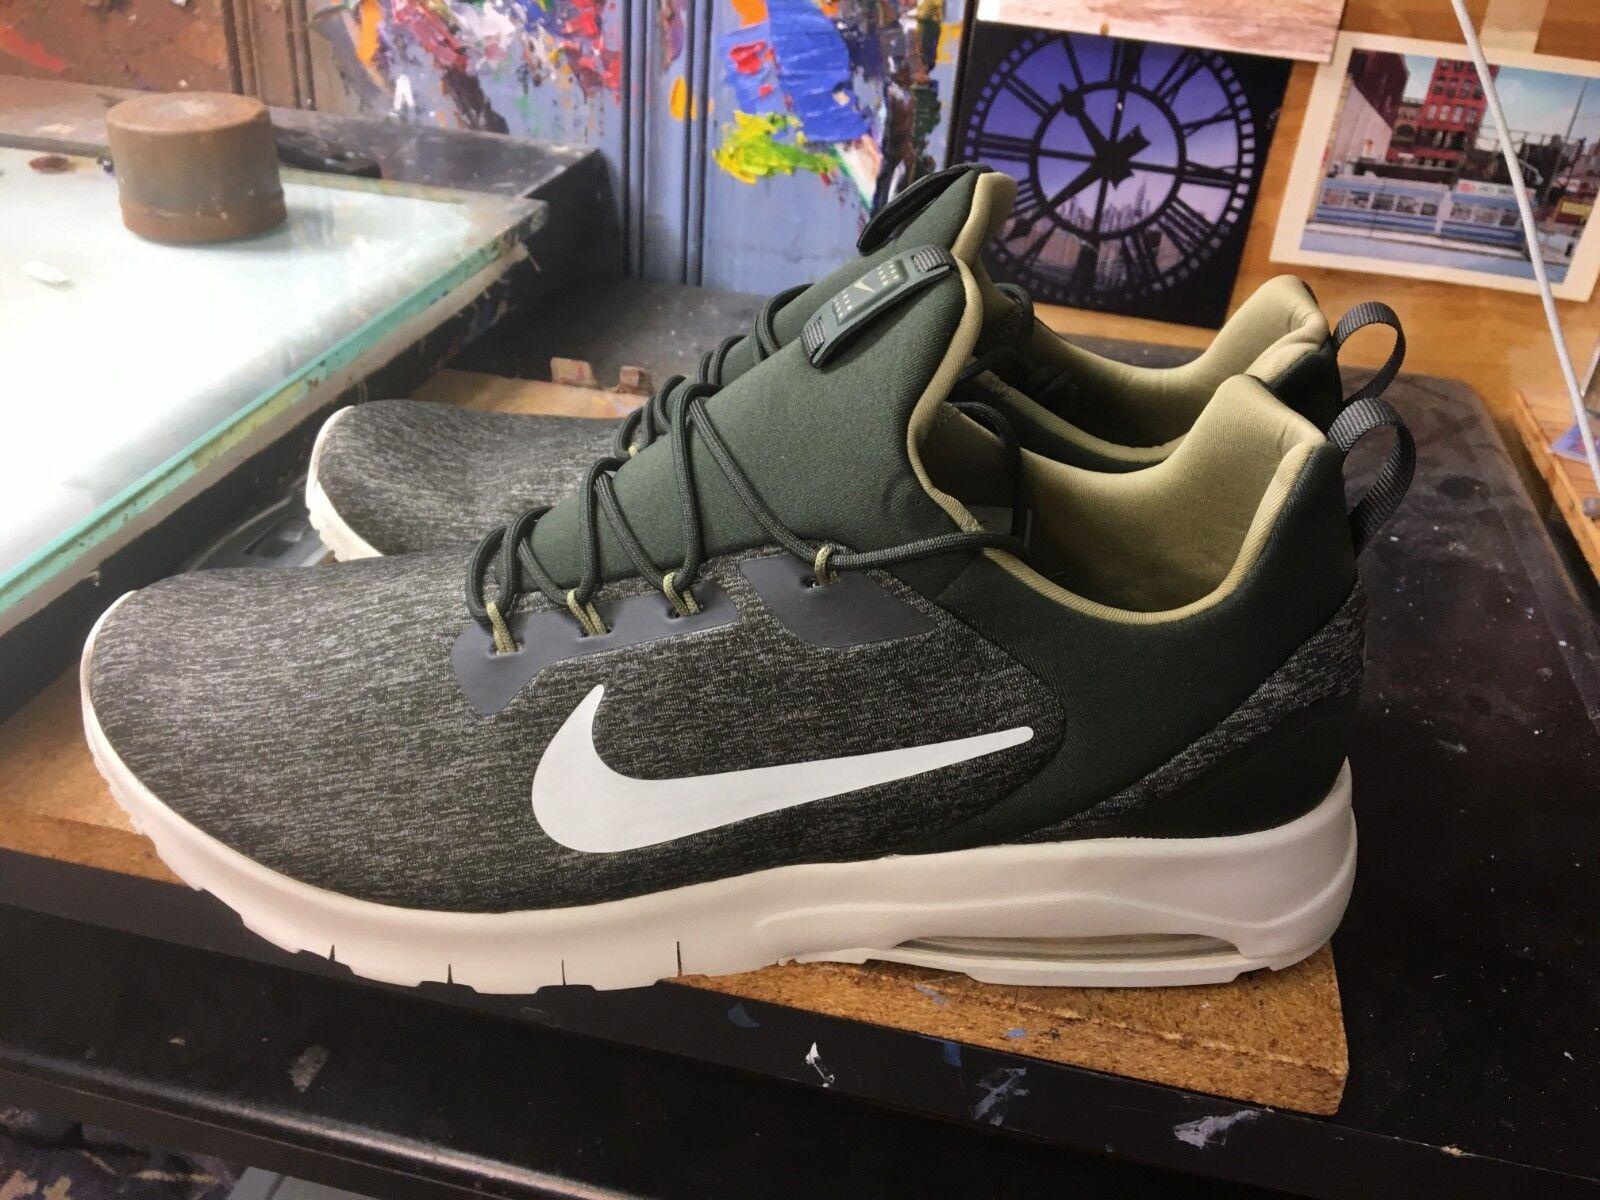 Nike Air Max Motion Racer Sequoia Light Bone Size US 12 Men's 916771 300